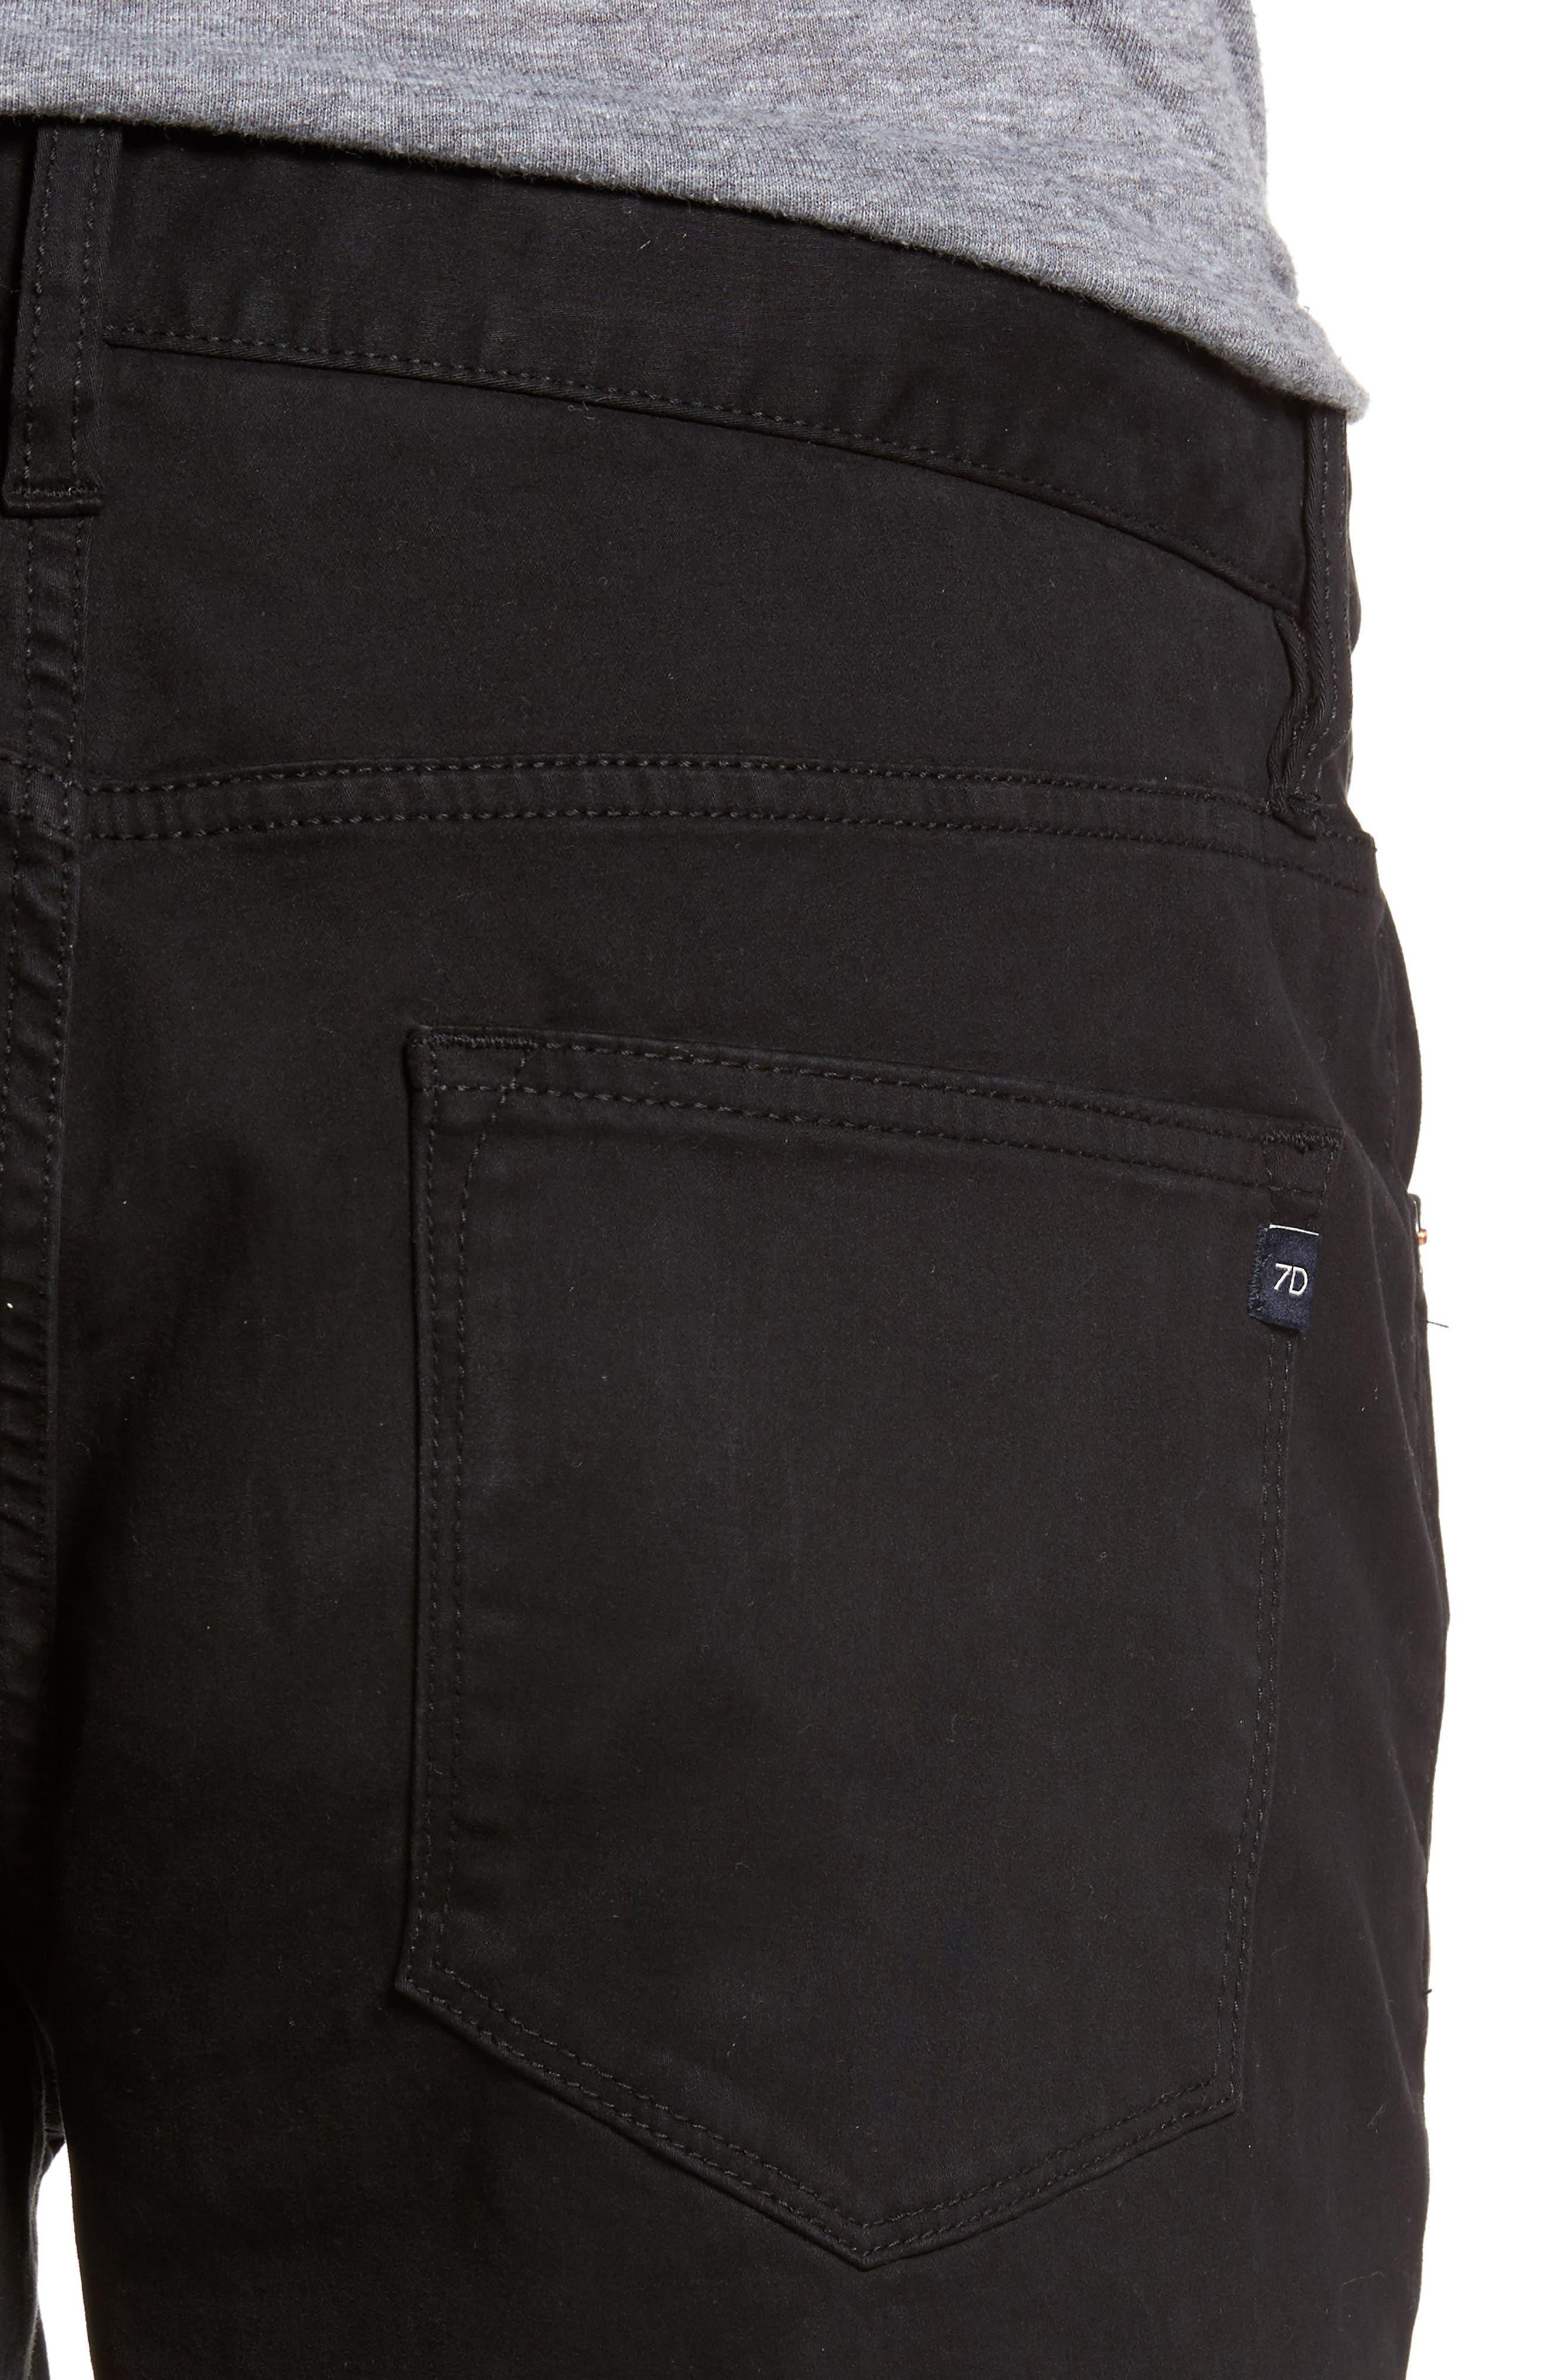 Brushed Twill Five-Pocket Pants,                             Alternate thumbnail 4, color,                             BLACK